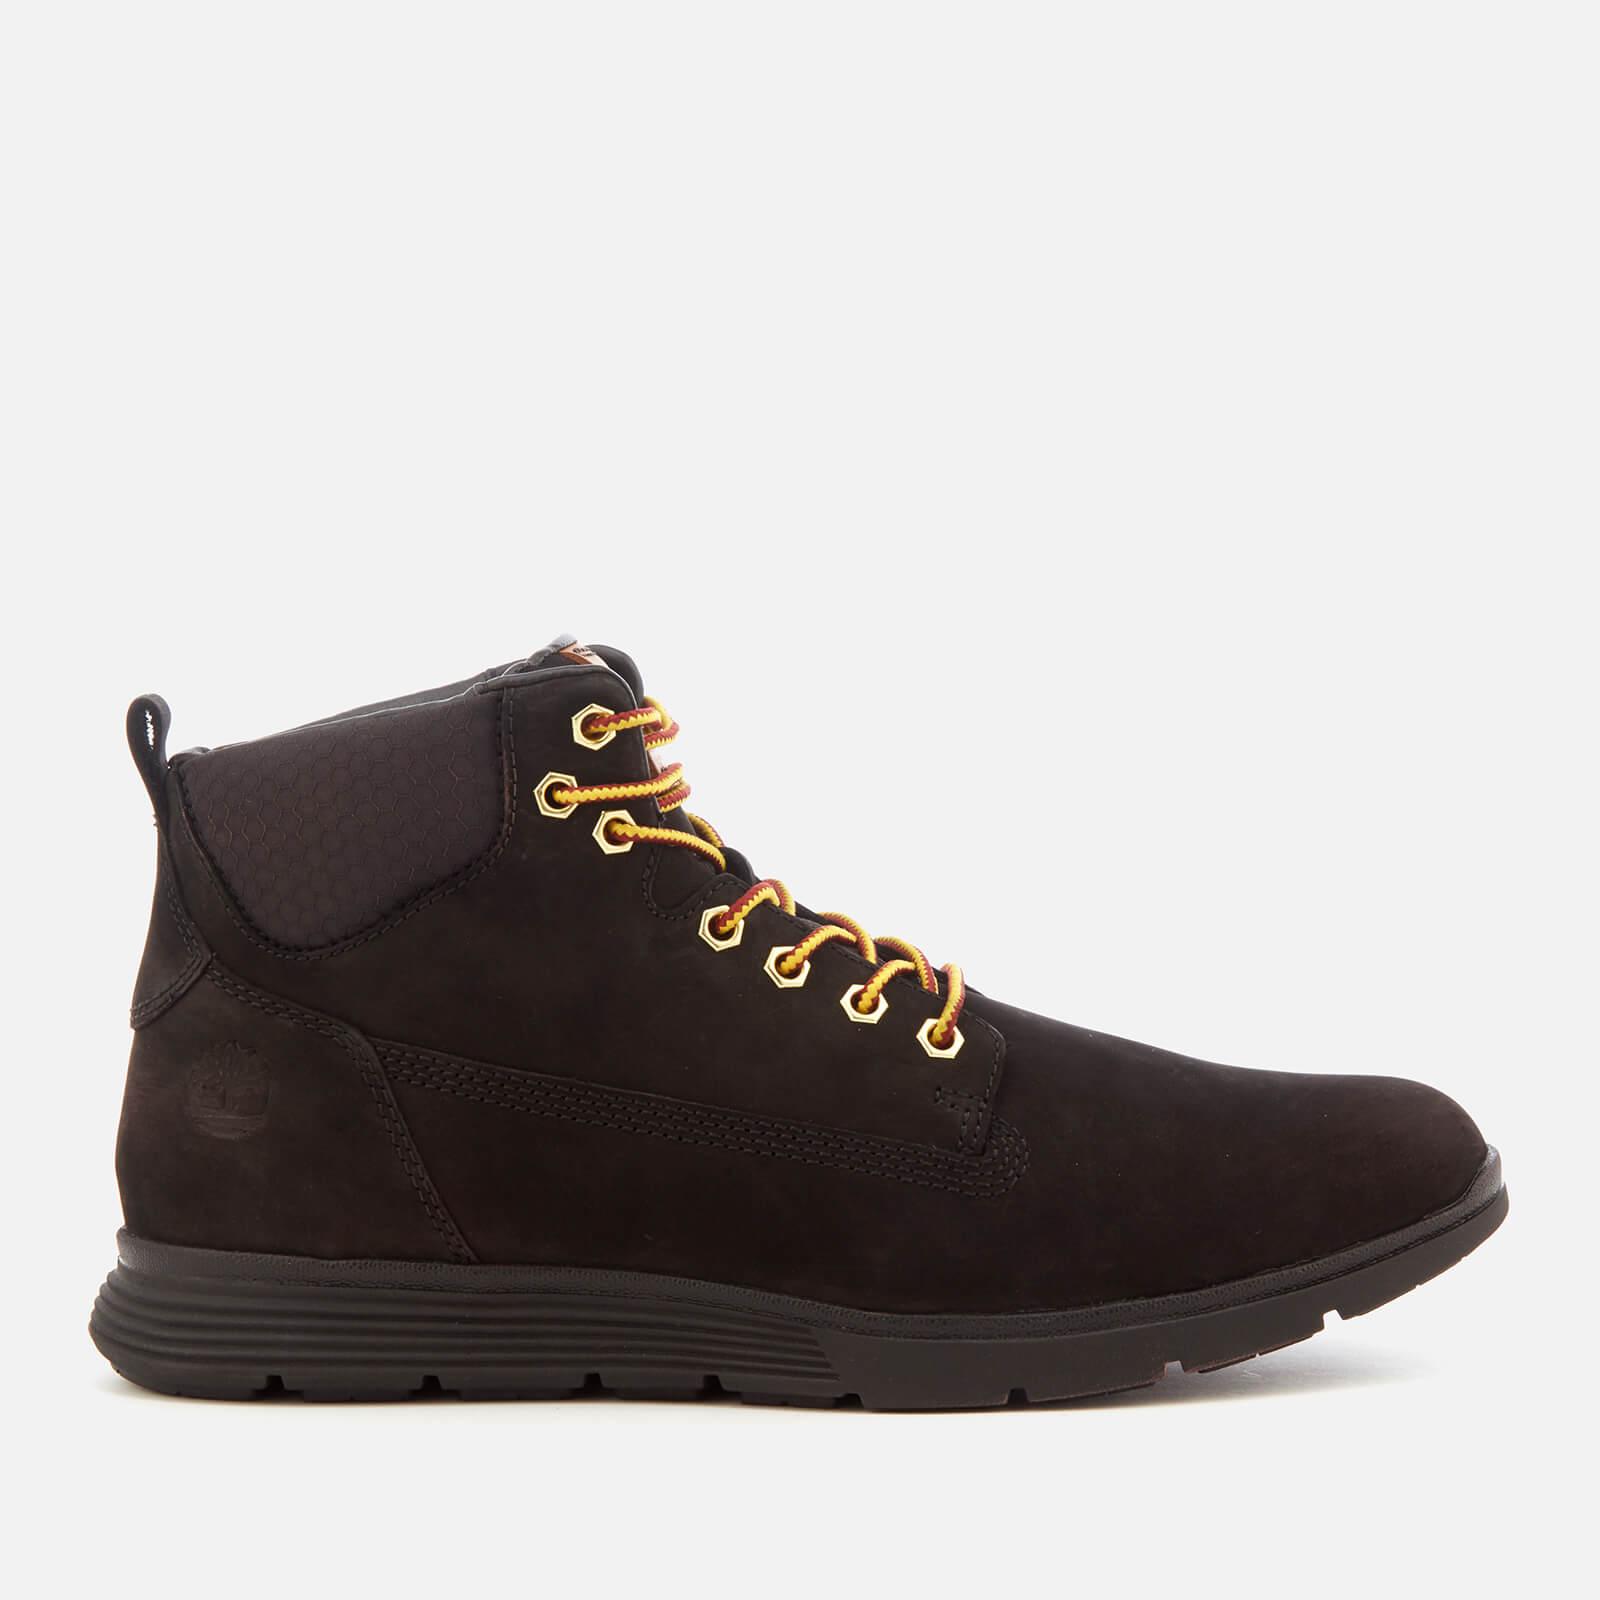 Timberland Men's Killington Chukka Boots - Black - UK 11